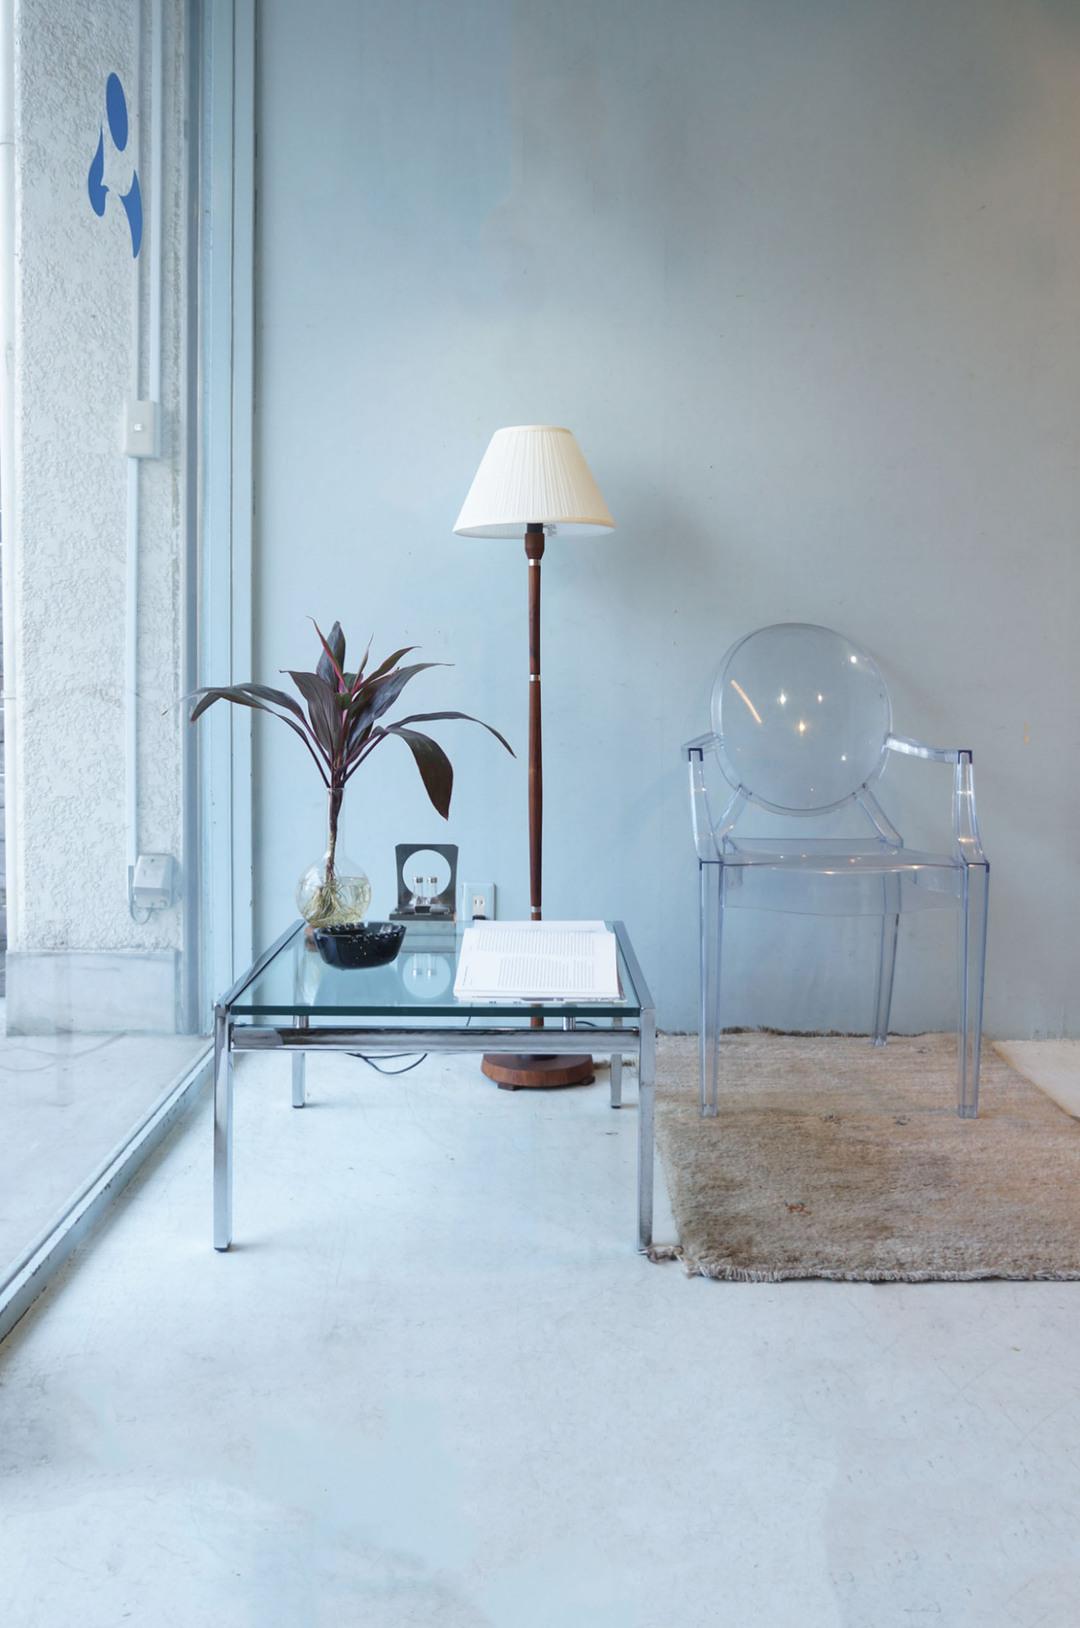 Glass Top Chromed Steel Square Center Table/ガラストップ スクエア センターテーブル クローム ローテーブル イタリアンモダン